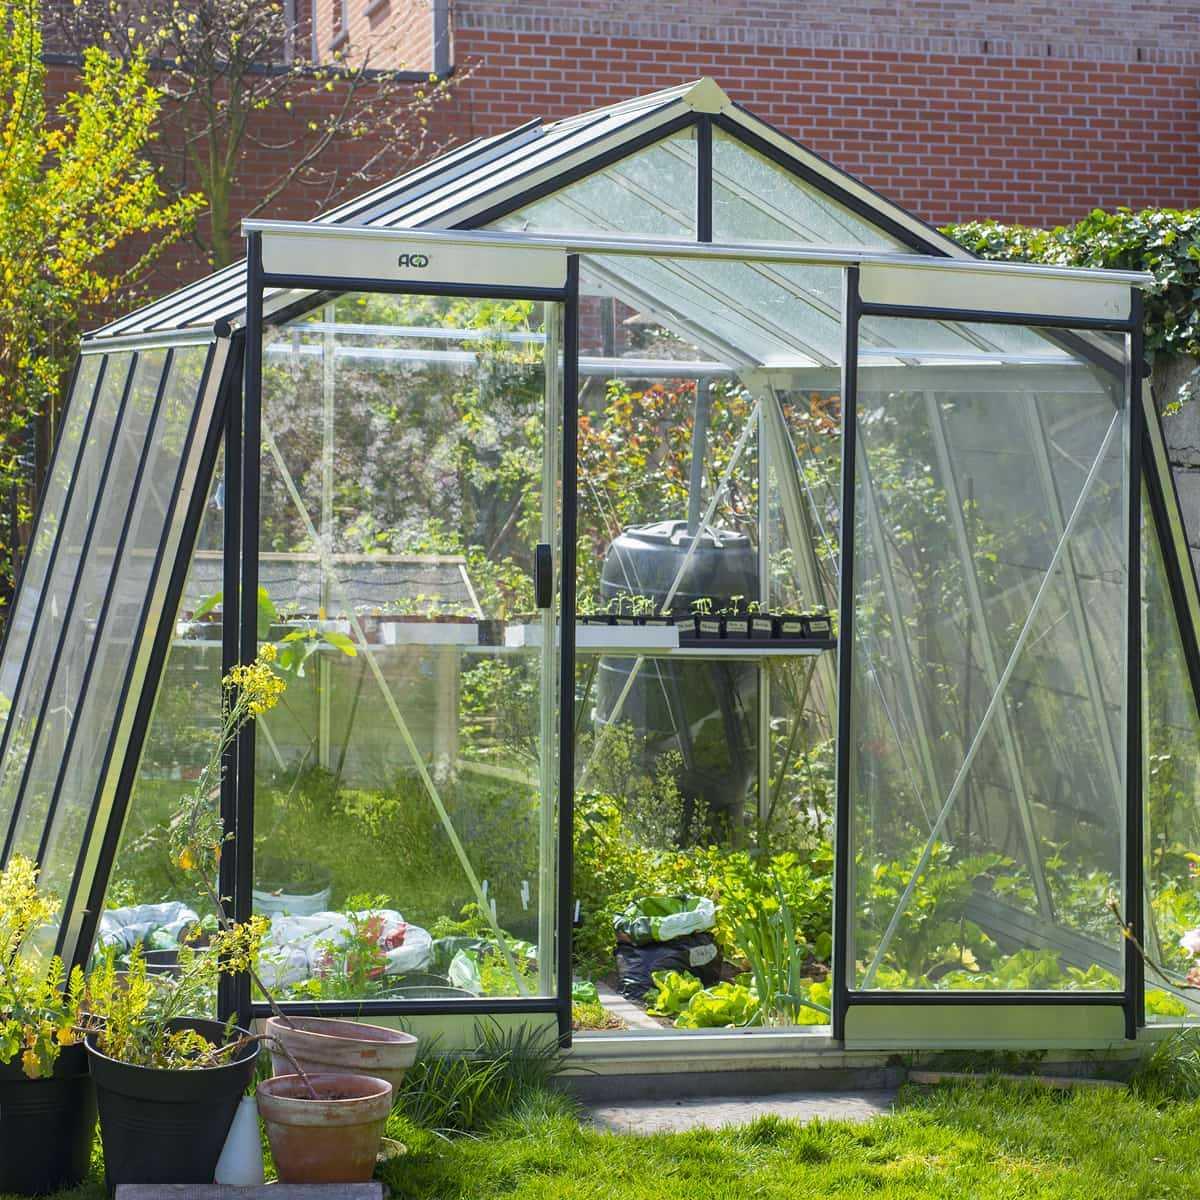 Serre De Jardin Prestige 9.12M2 Paroi Oblique S104H encequiconcerne Promo Serre De Jardin En Verre